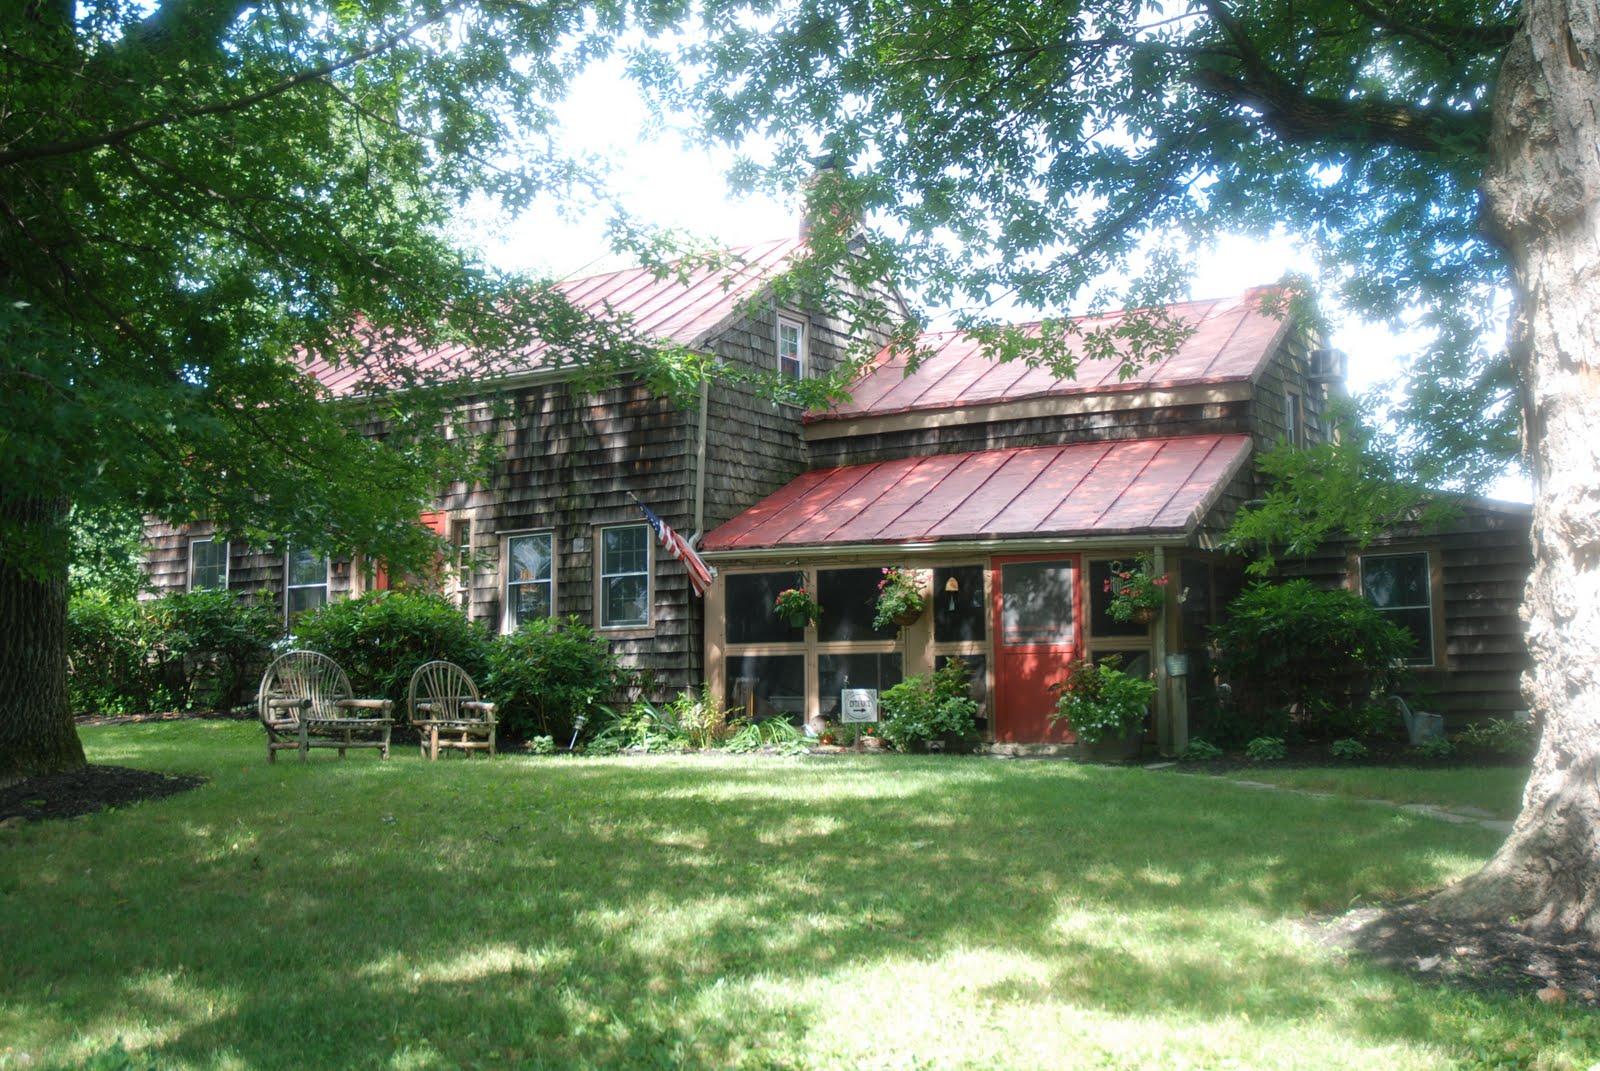 Audrey's Farmhouse